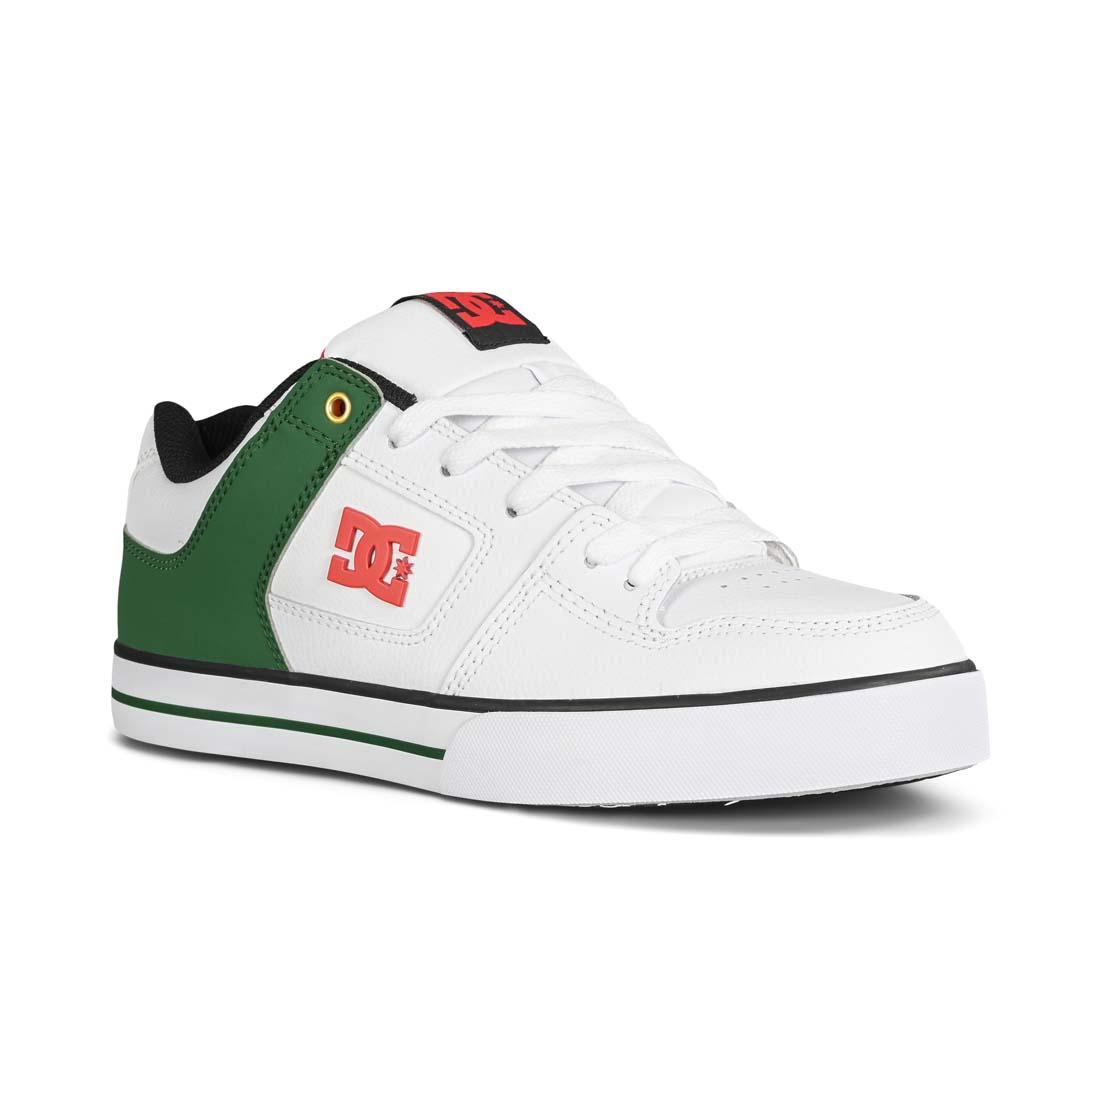 DC Shoes Pure SE - Black / White / Gold